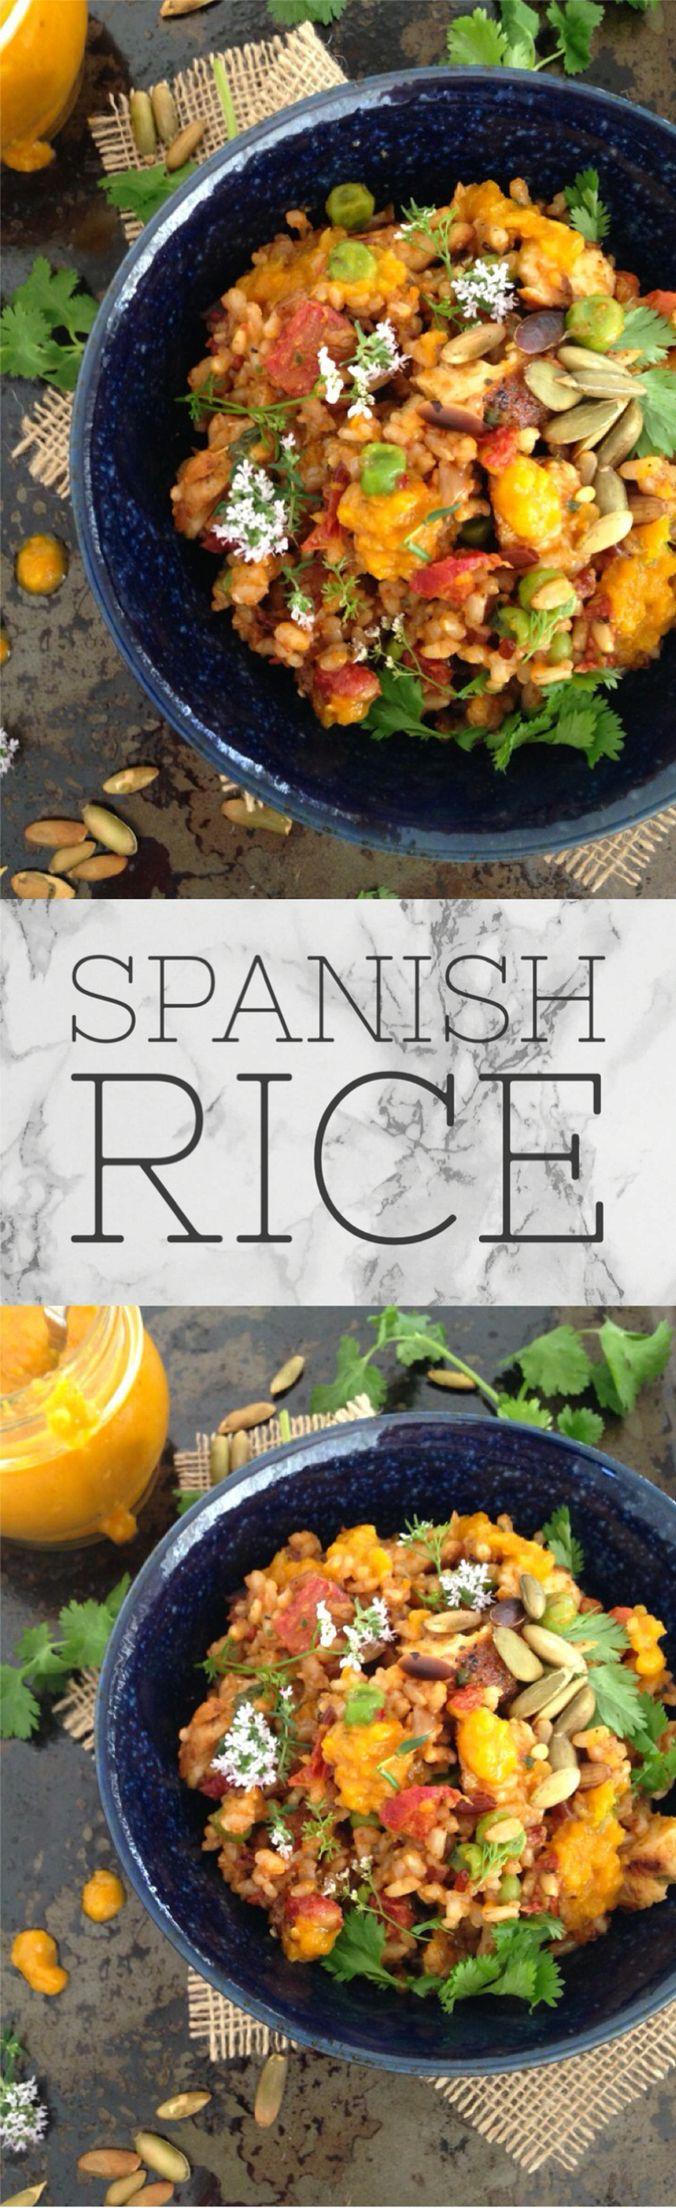 Baked Spanish Rice Recipe | CiaoFlorentina.com @CiaoFlorentina